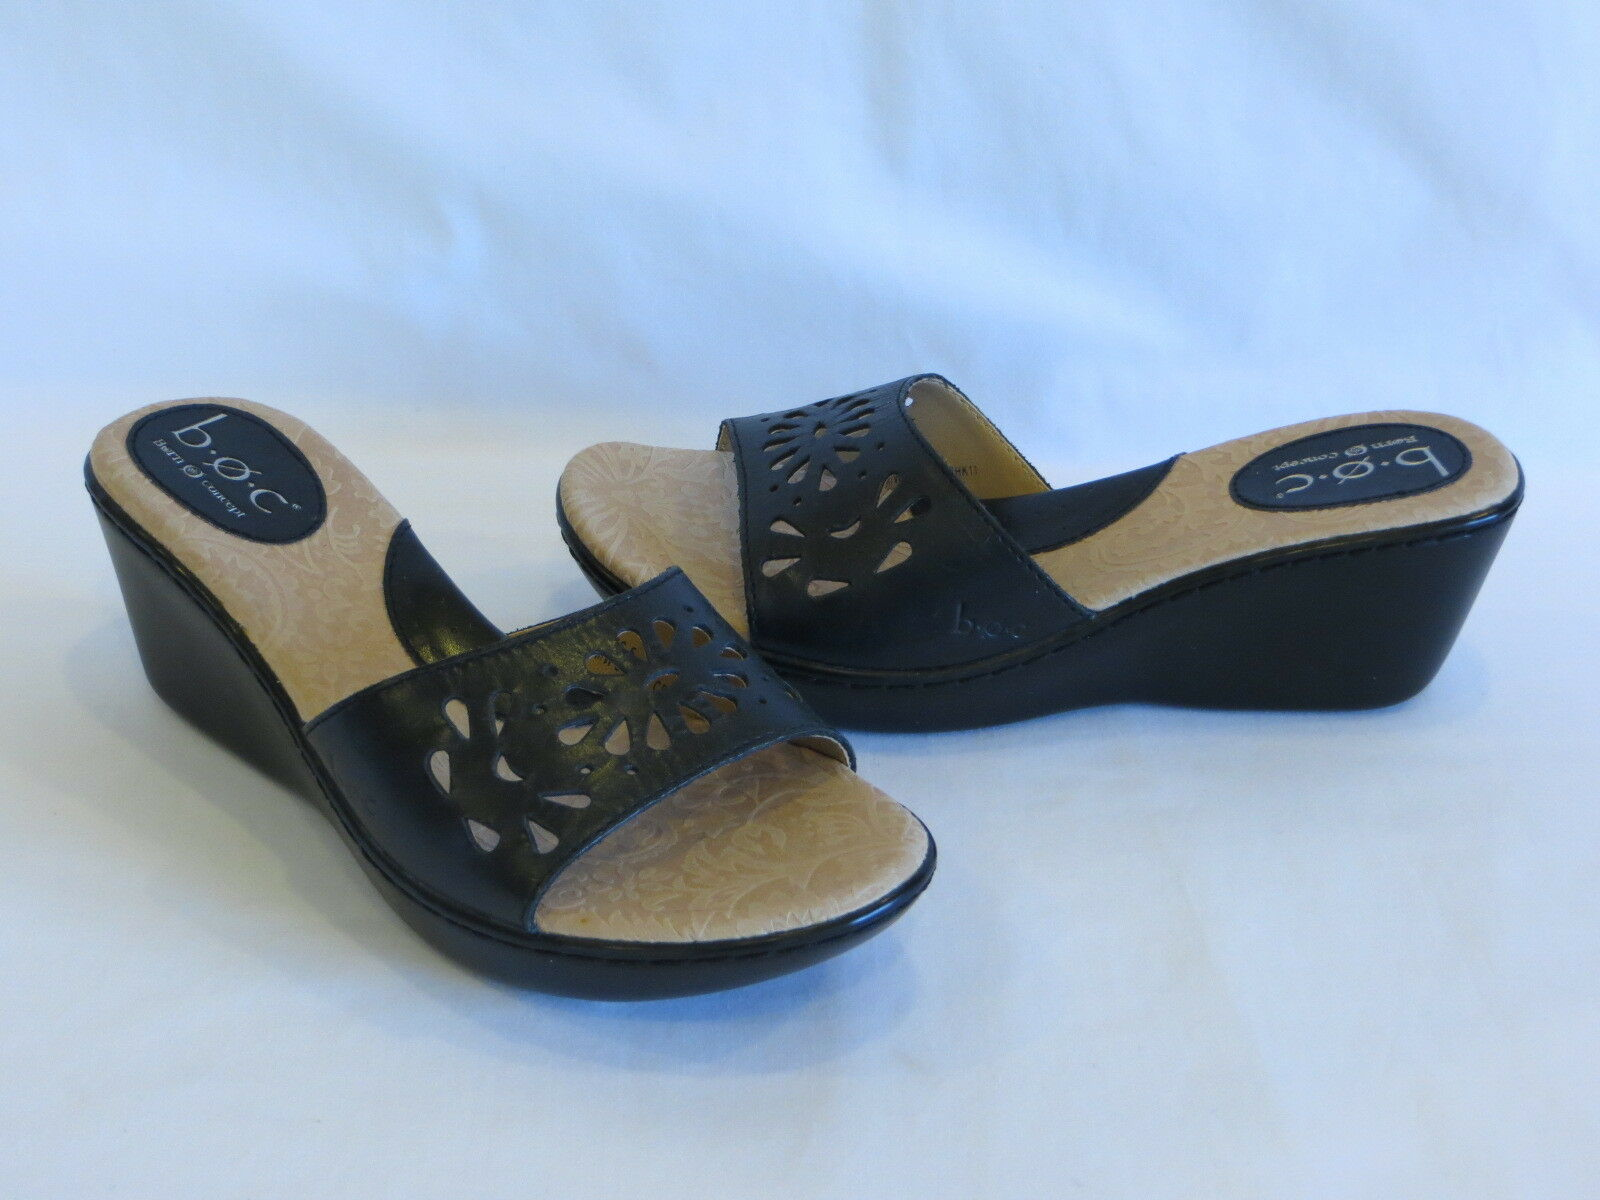 B.O.C. Born Concept  Yadira  Black Leather Sandals Wedge Heels Slides - 6M 36.5